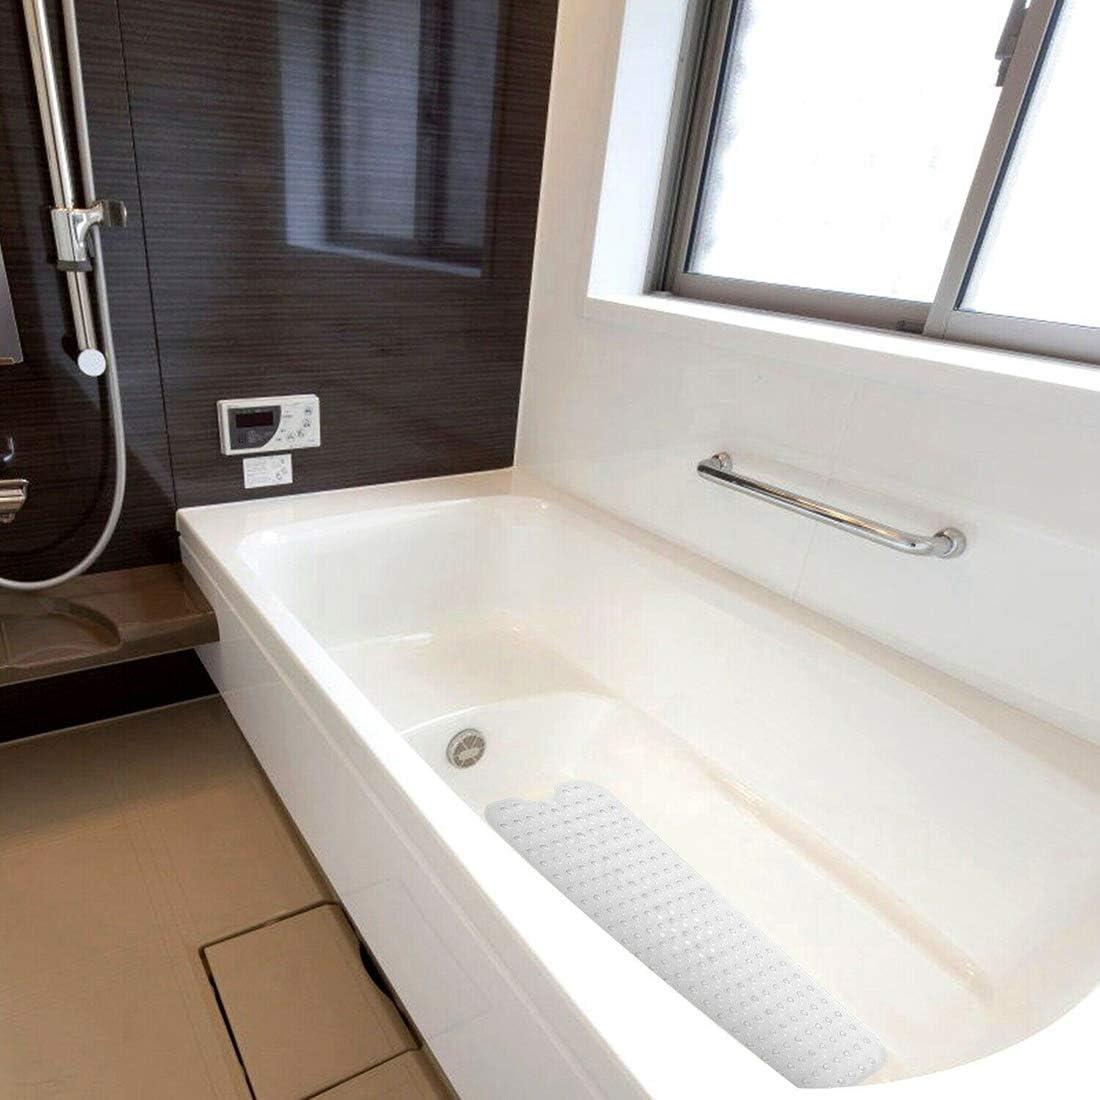 Bathtub Mat Non Slip Bathroom Shower Mat Antibacterial Machine Washable Safety Anti Slip Bath Mat with Suction Cups for Kids Elderly White